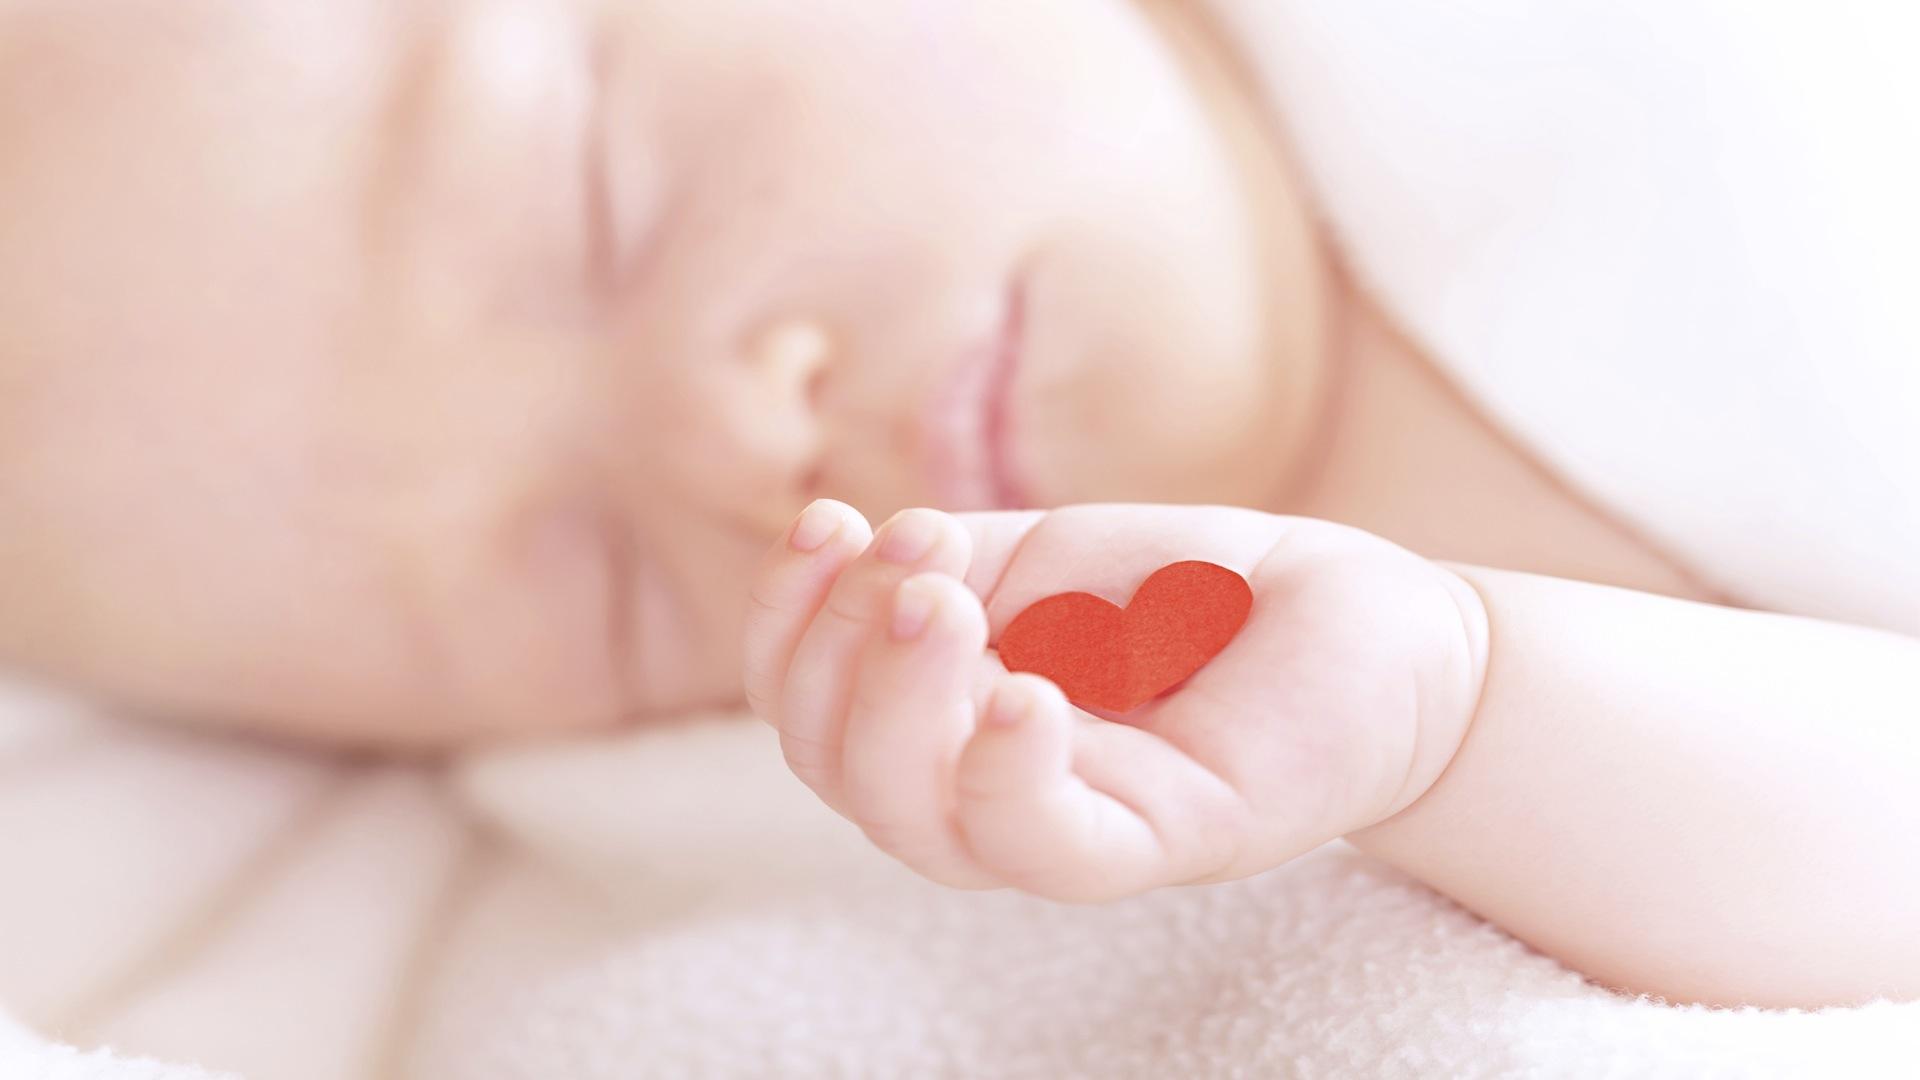 newborn-baby-girl-with-heart.jpg